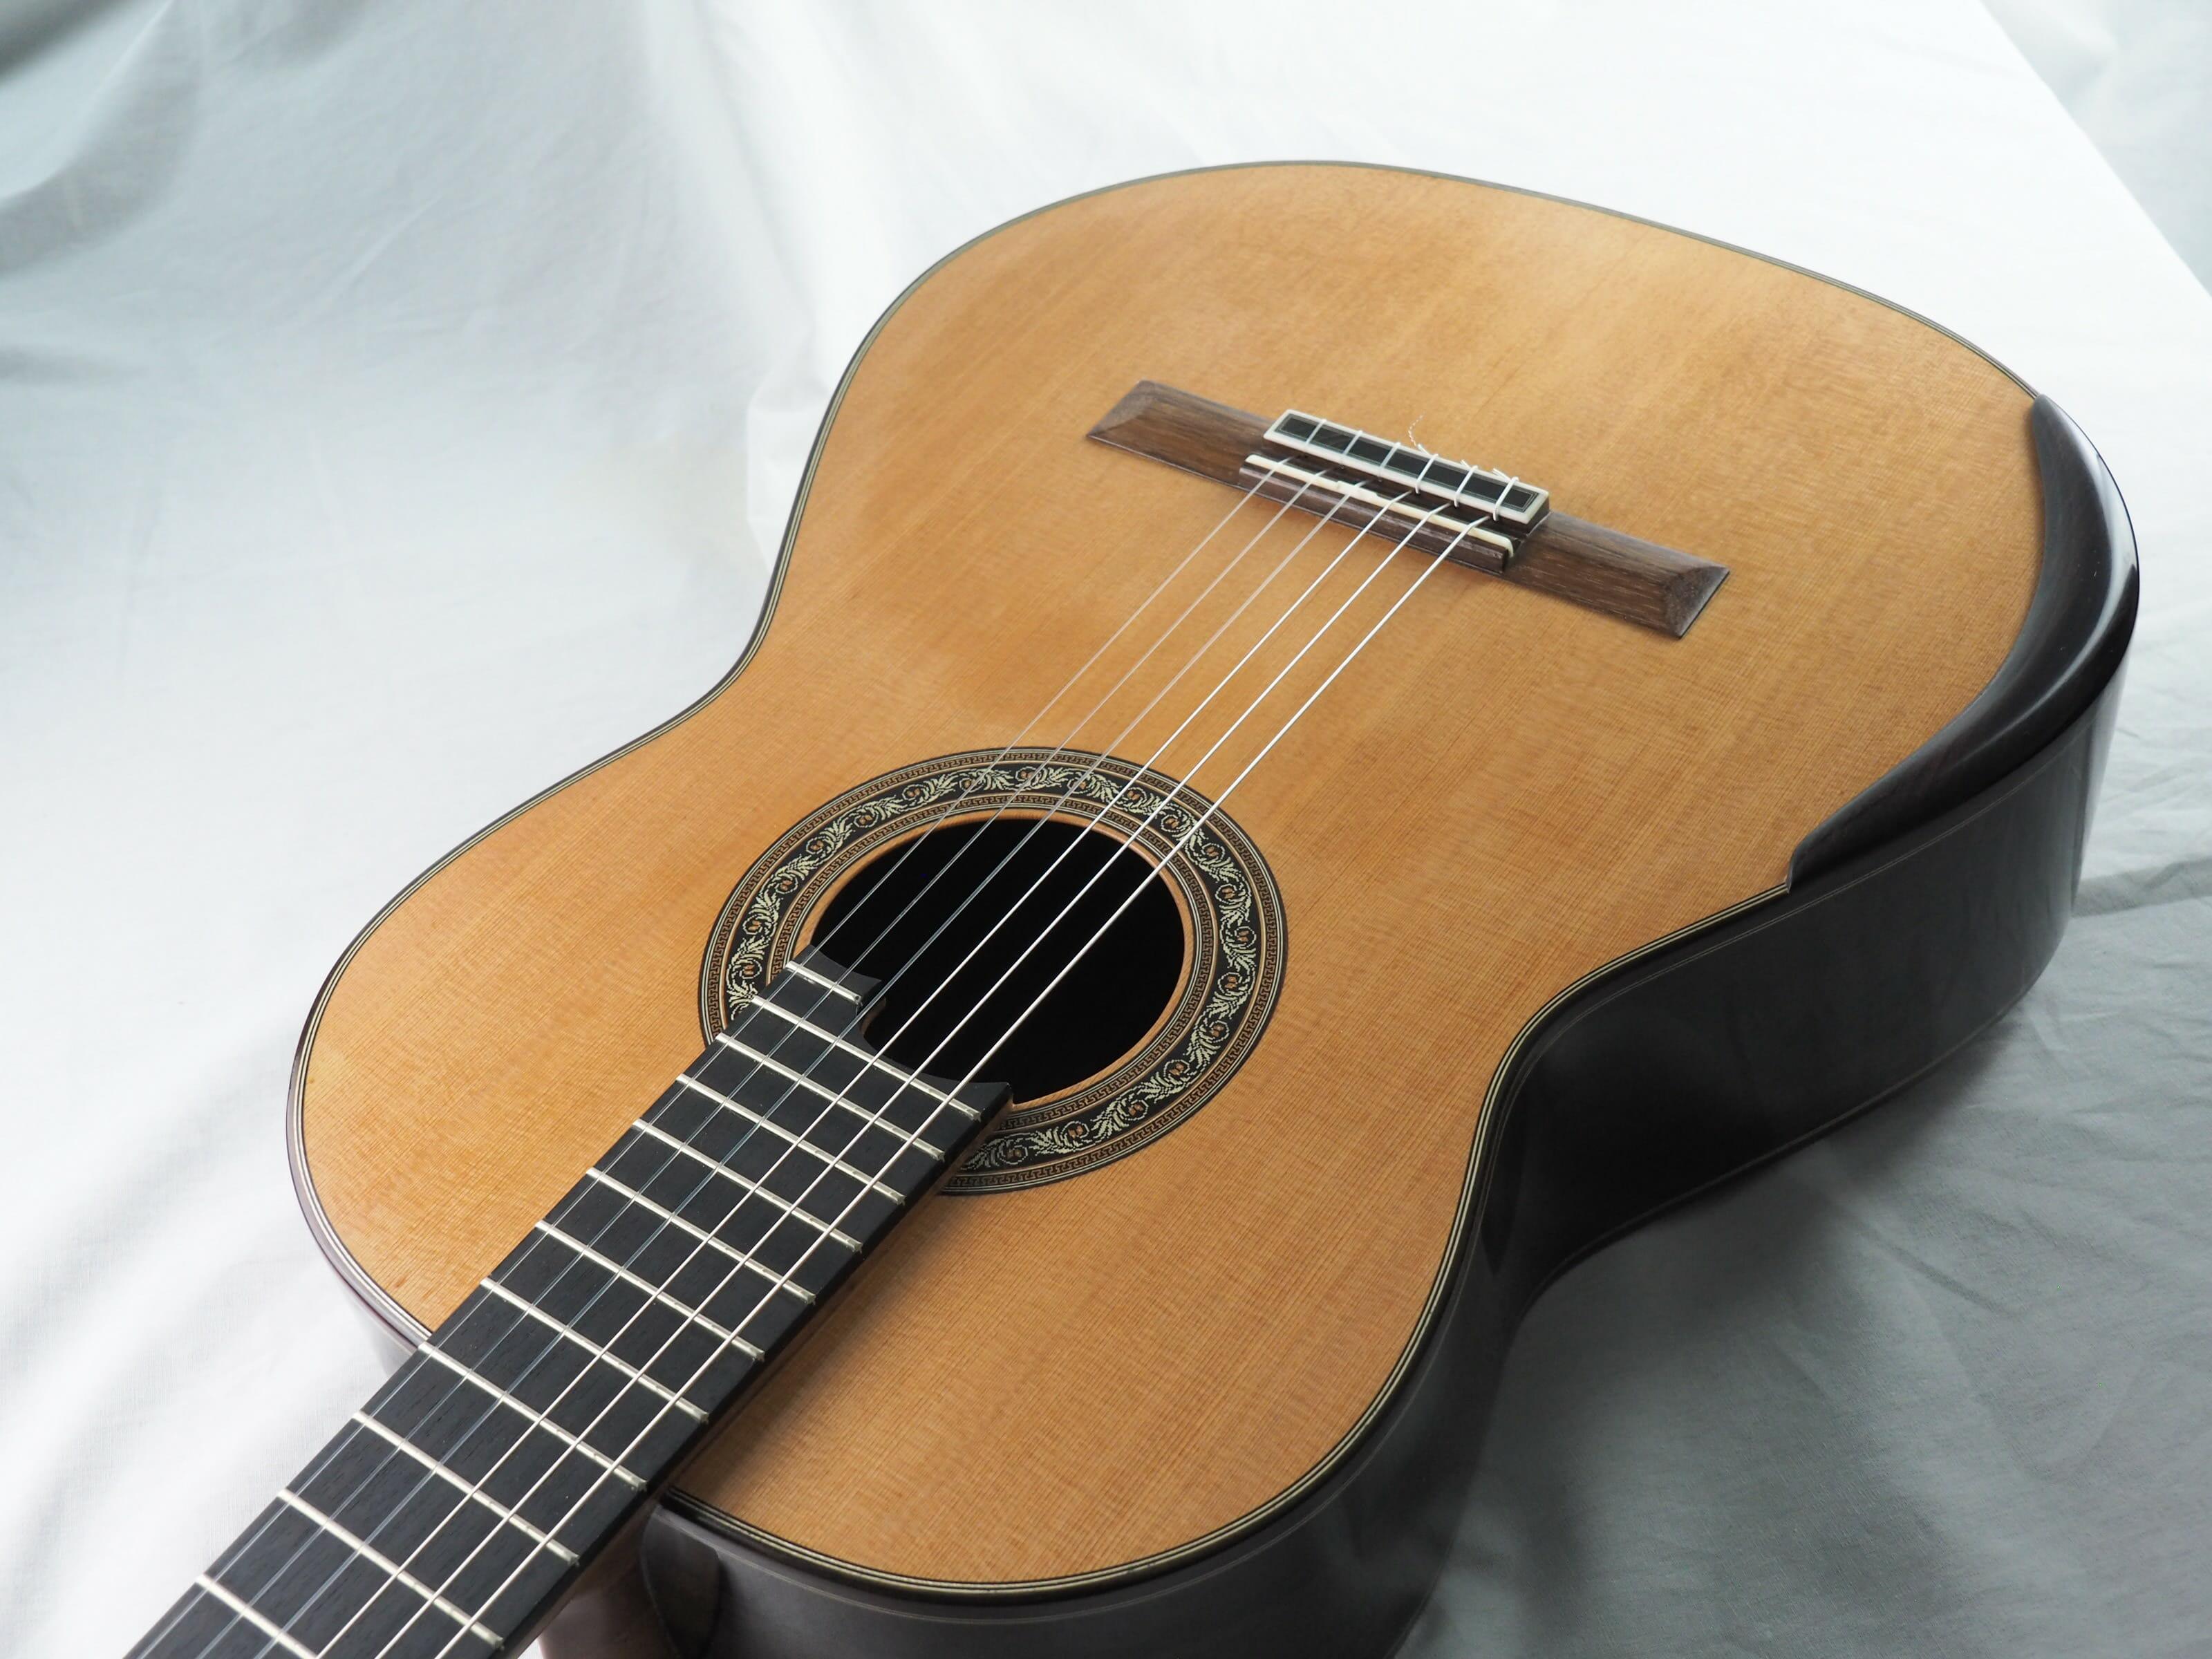 Charalampos Koumridis Luthier guitare classique N°139 19KOU139-02